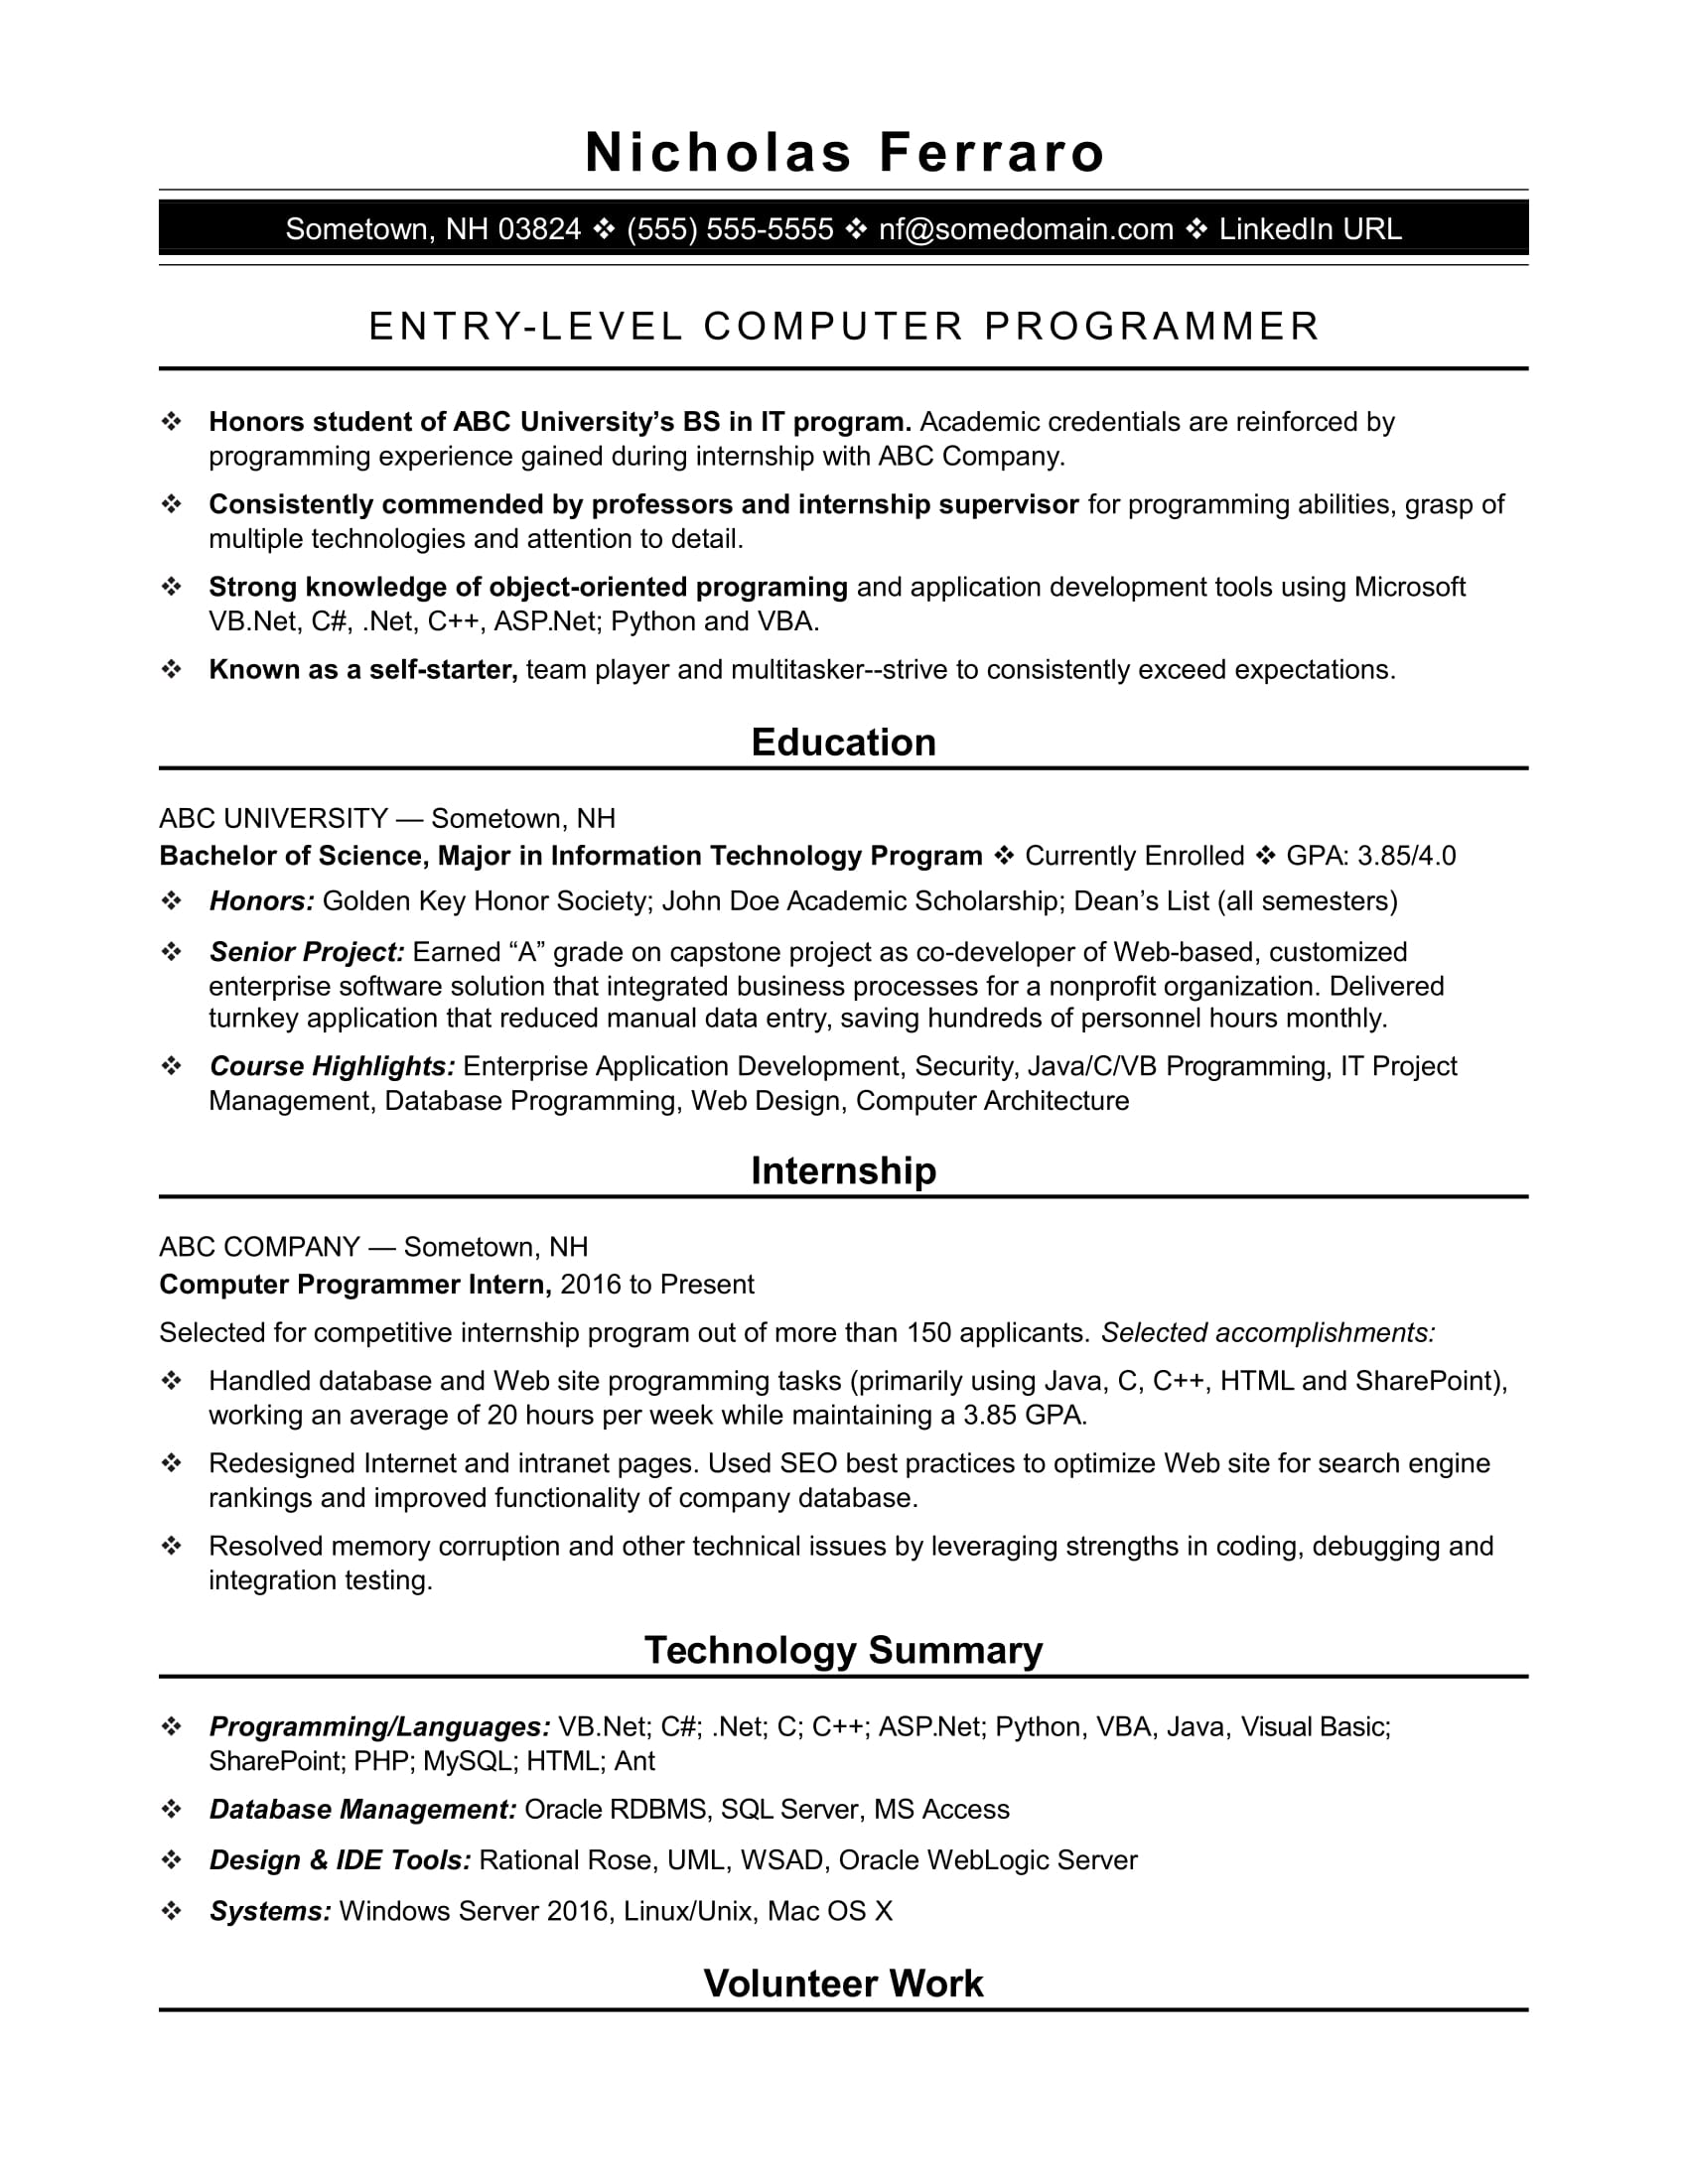 sample computer programmer resumes